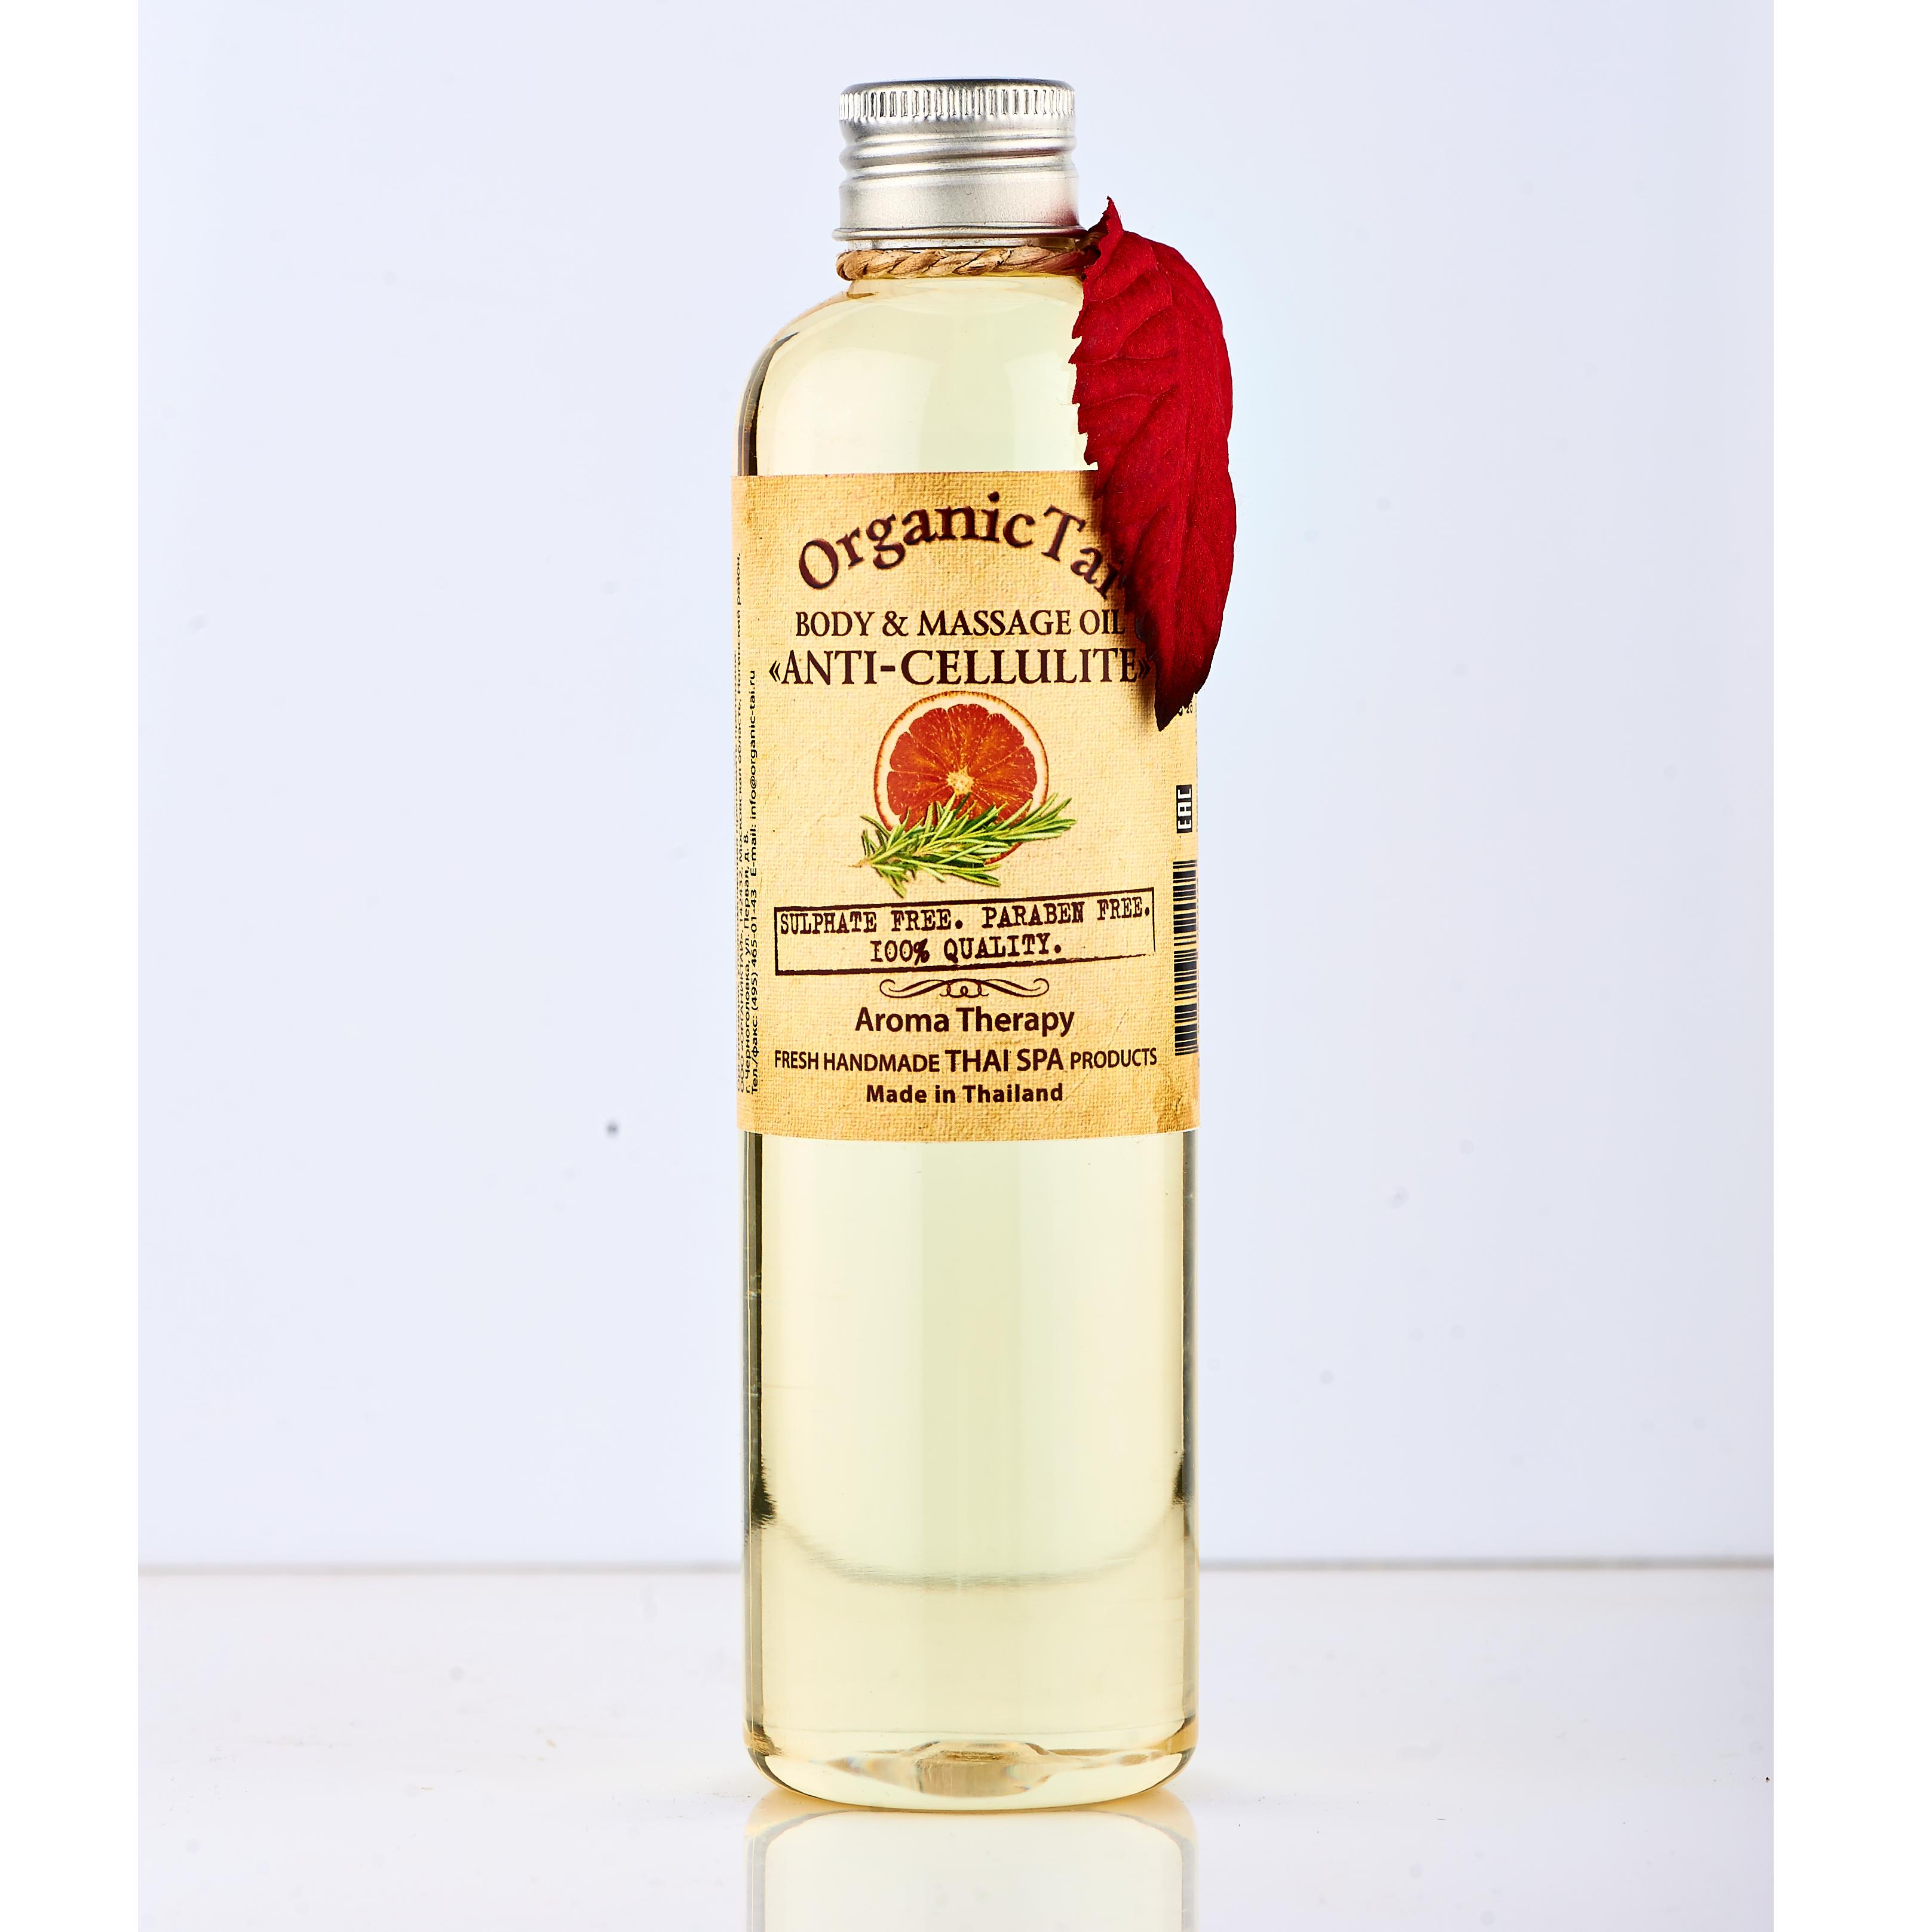 ORGANIC TAI Масло для тела и аромамассажа Антицеллюлитное 260мл